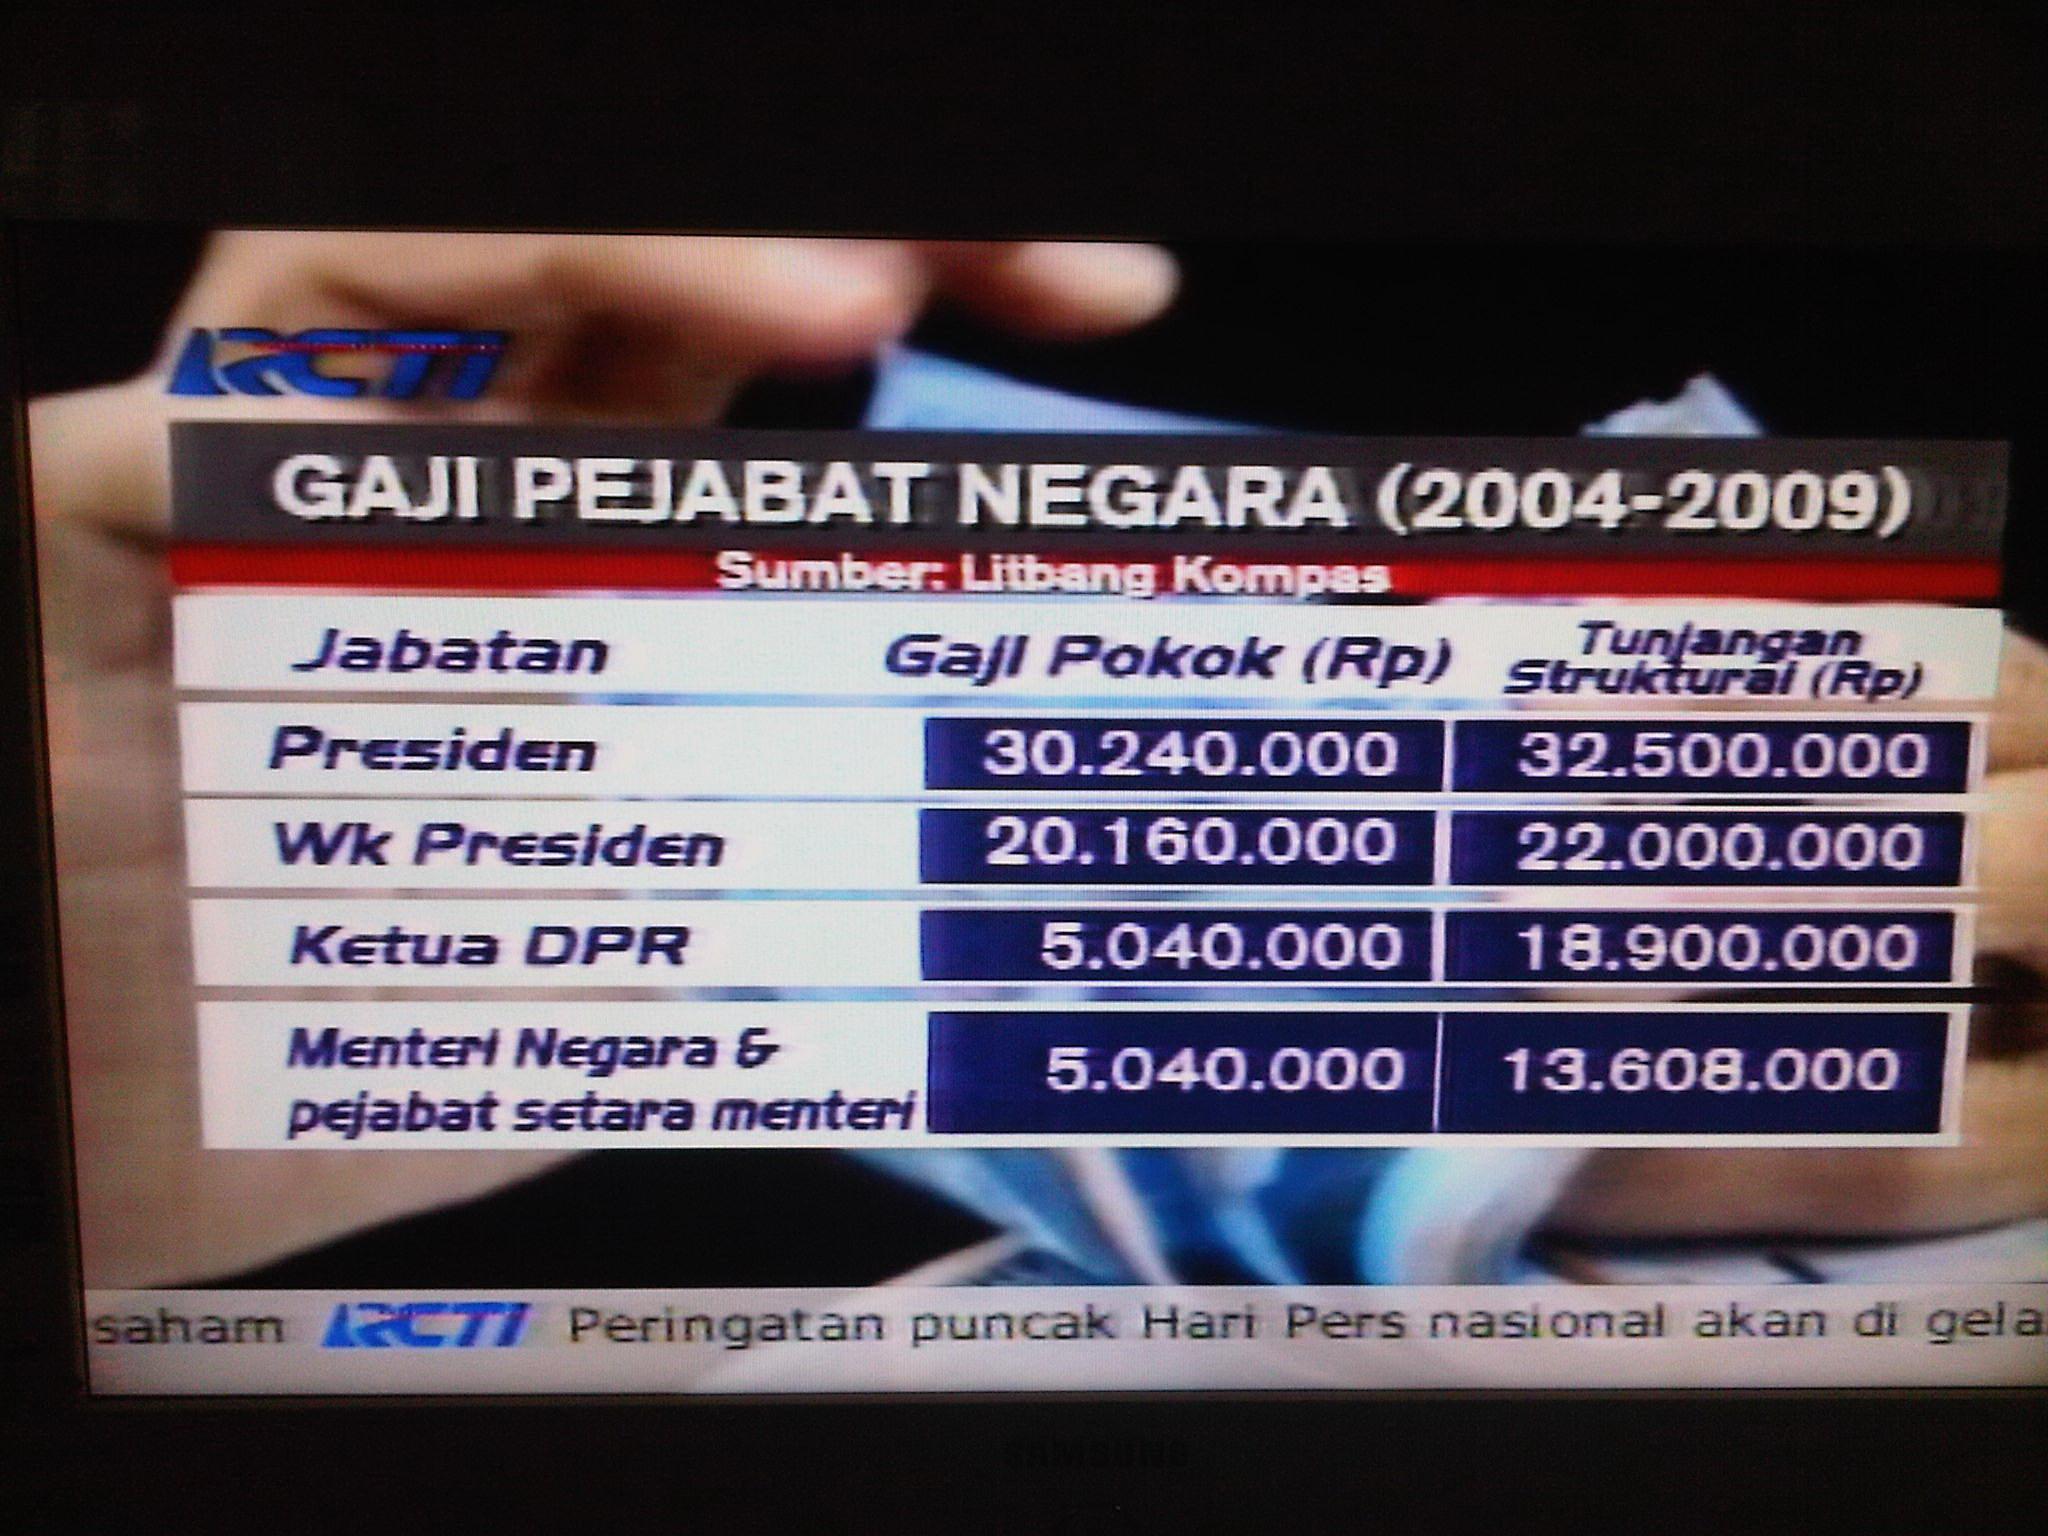 gaji Pejabat Negara Indonesia